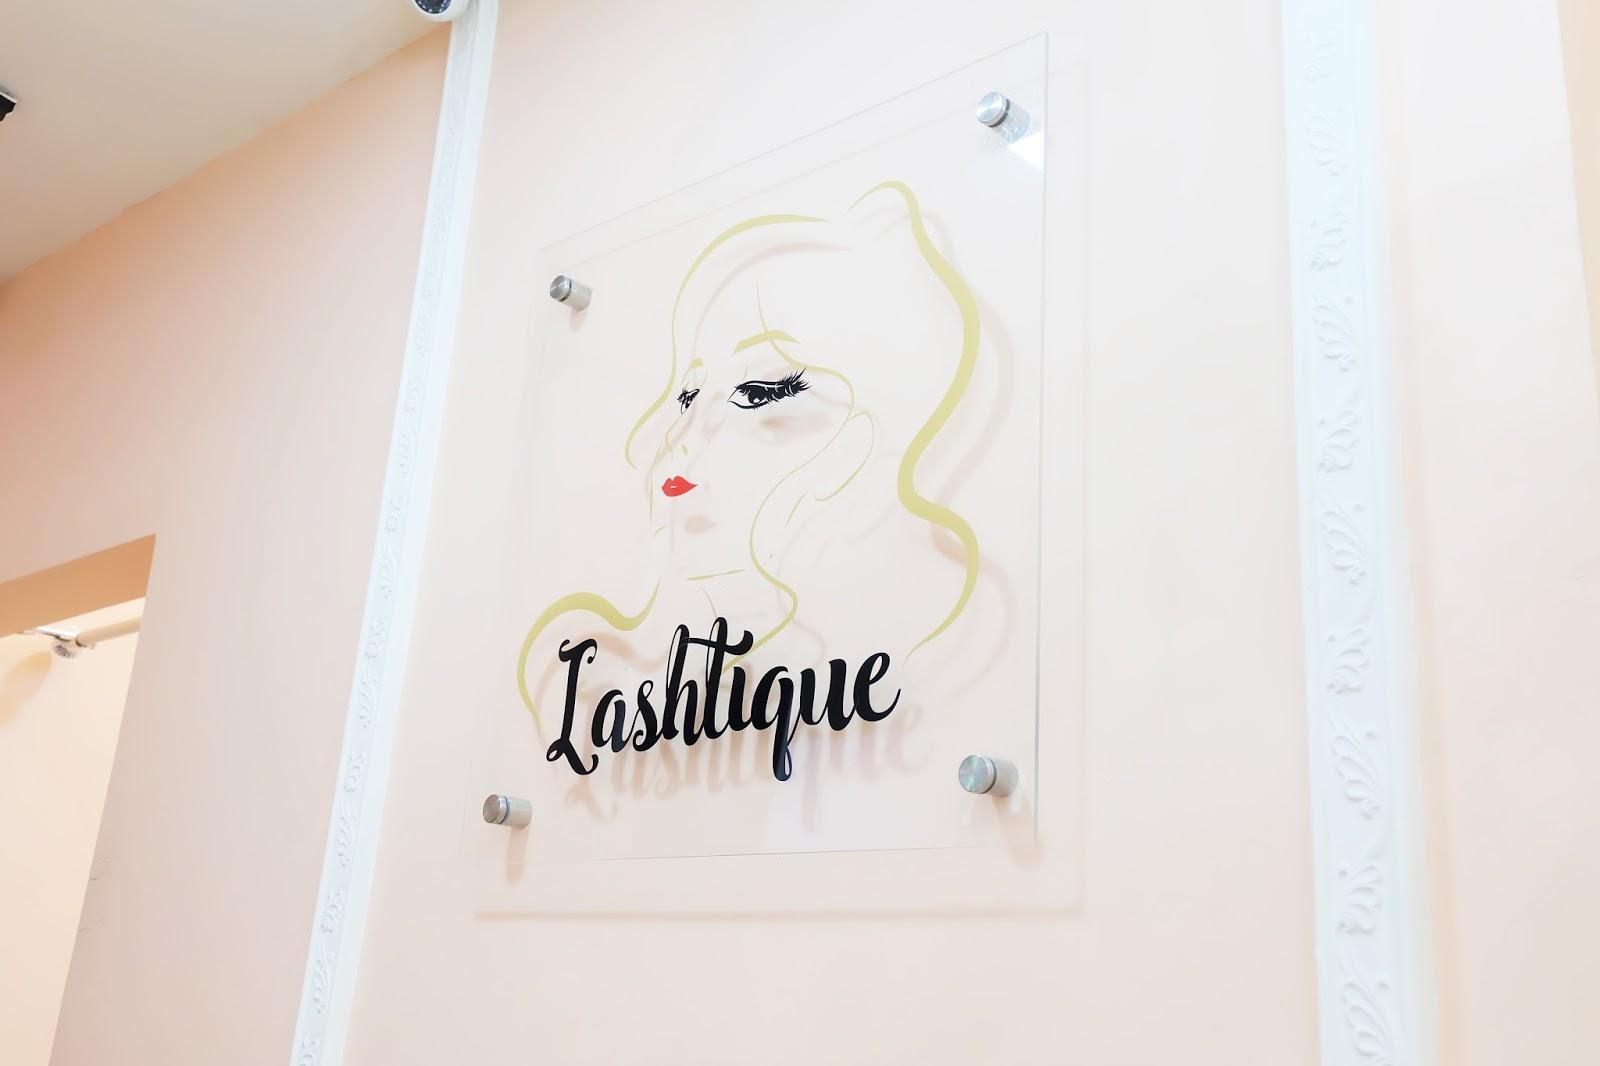 c575e9ed37c Akhirnya aku mempercayakan pengalaman eyelashes extensions pertama aku di  Lashtique. Lashtique ini termasuk ke dalam International Eyelash Designers  ...